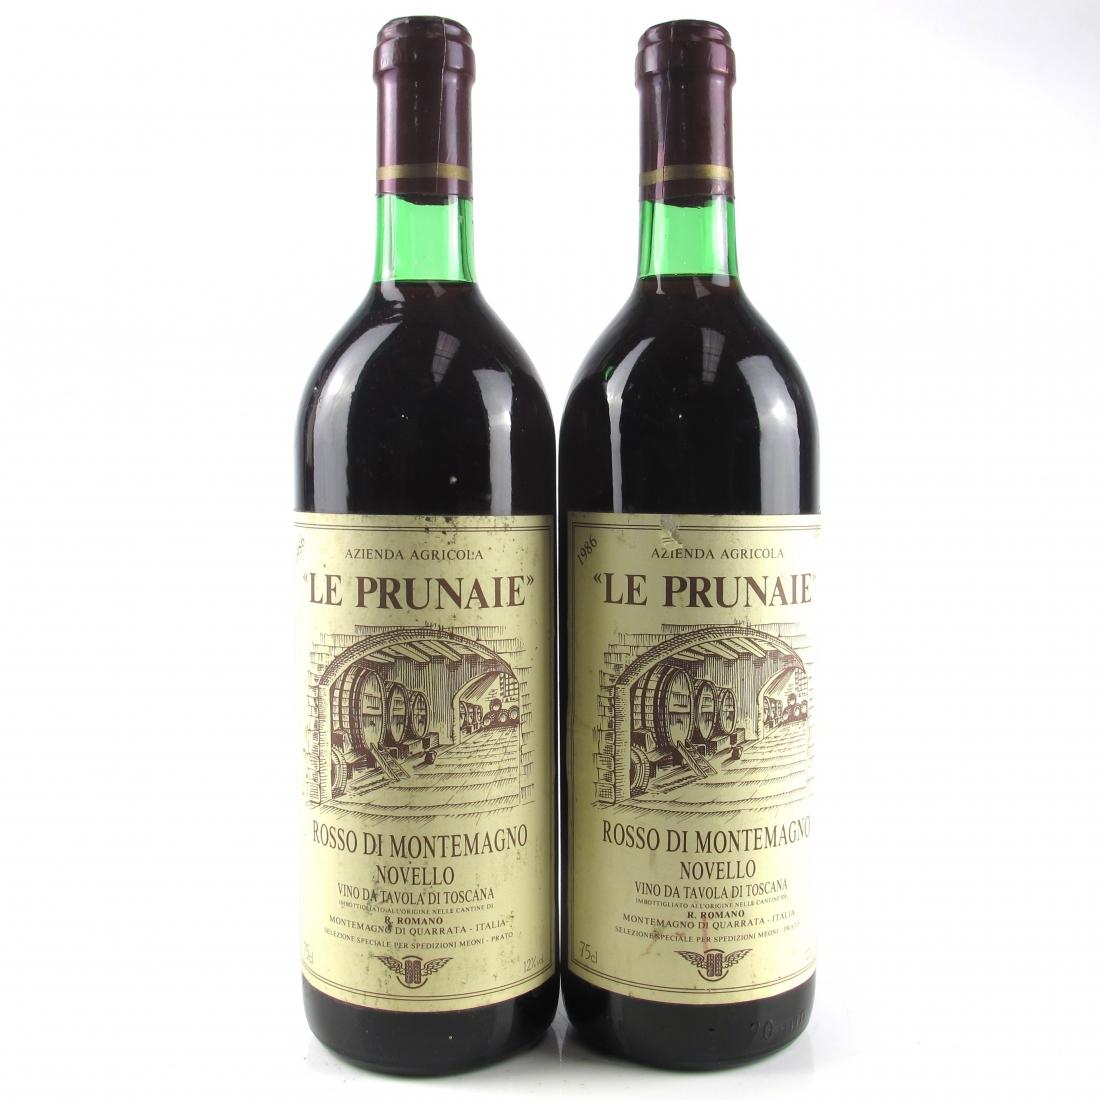 Le Prunaie 1986 Tuscany 2x75cl